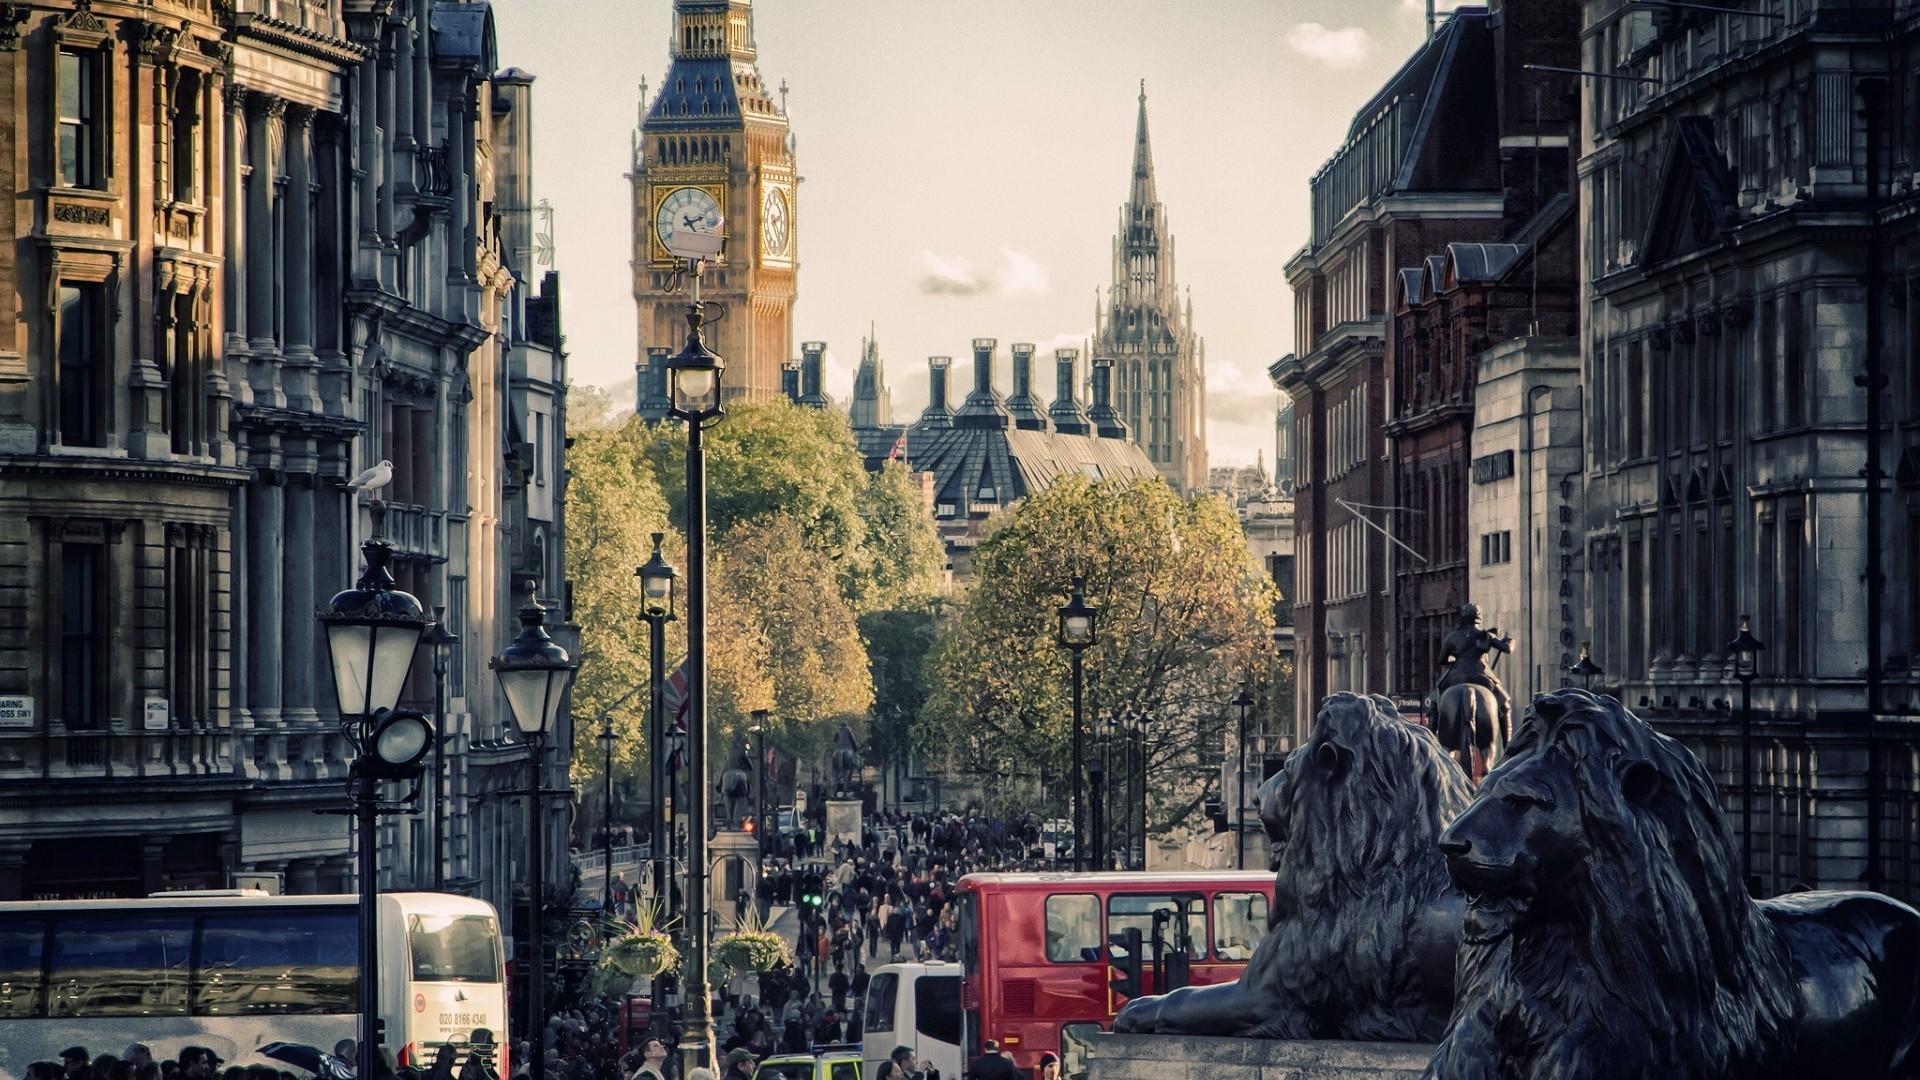 England London Big Ben United Kingdom Wallpaper - MixHD wallpapers